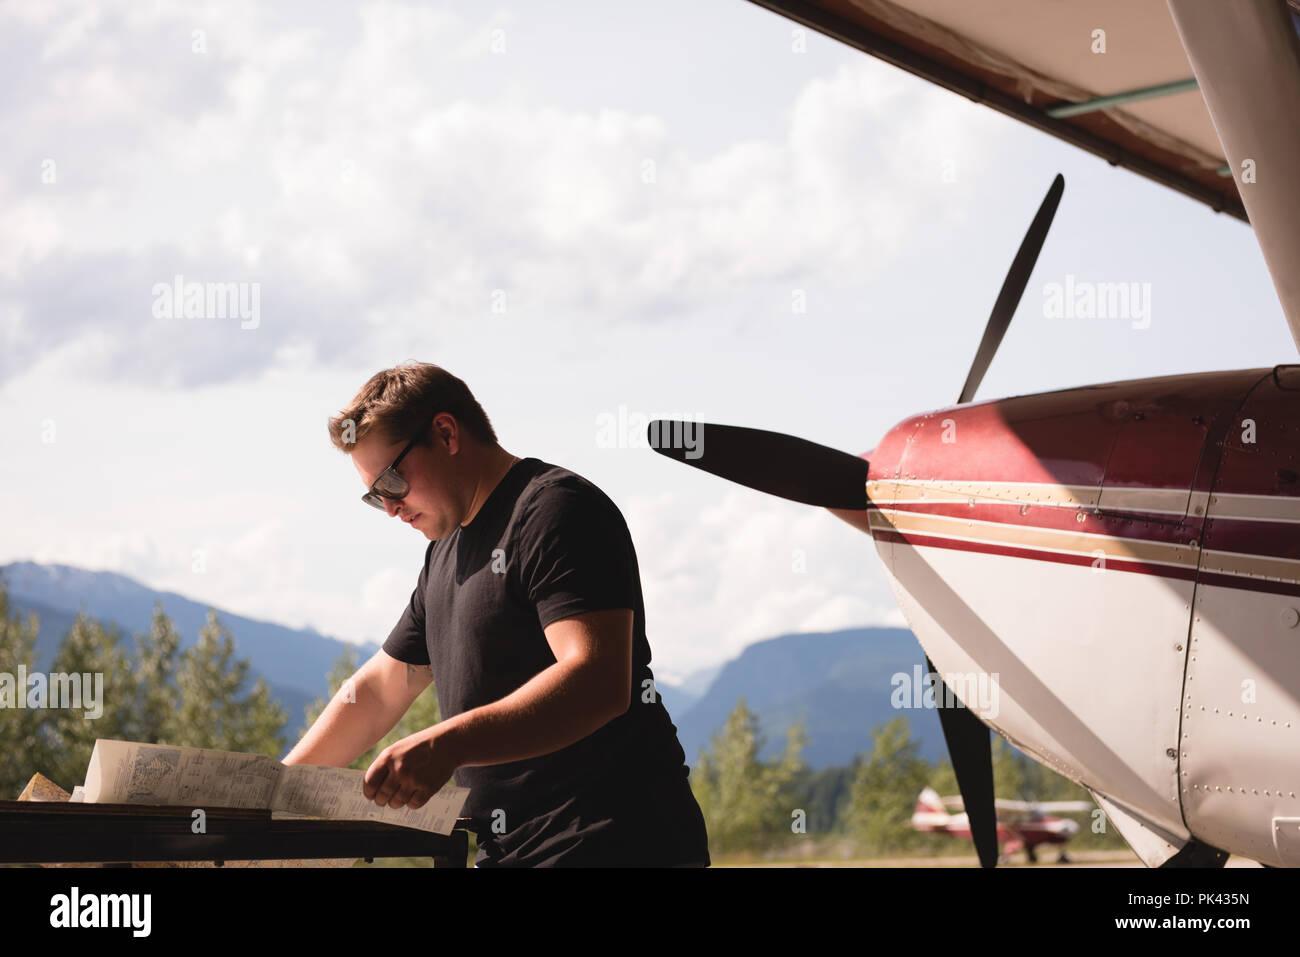 Mechanic working at aerospace hangar - Stock Image